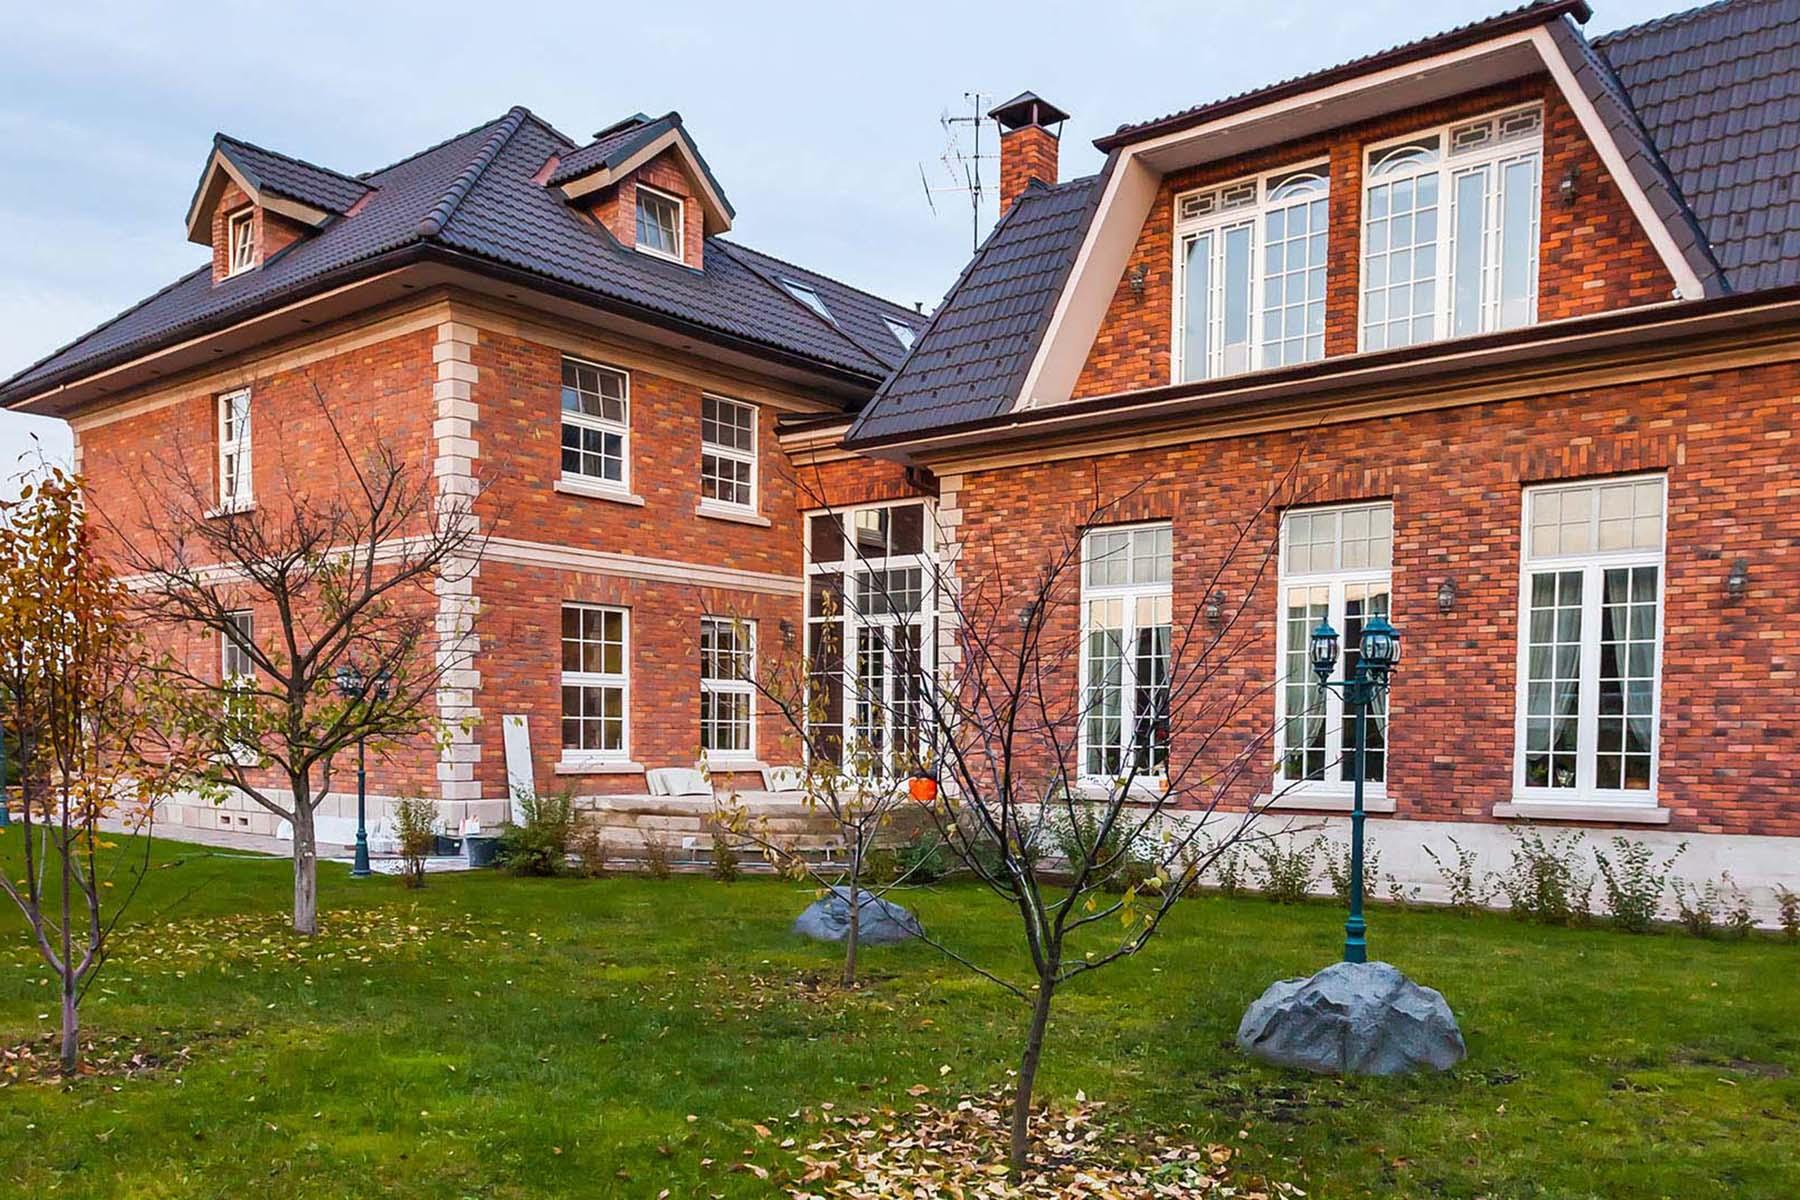 Moradia para Venda às Magnificent house in Novoaleksandrovo Moscow region, Dmitrovskoye Highway, Novoalexandrovo, Other Moscow, Moscou, 186000 Rússia